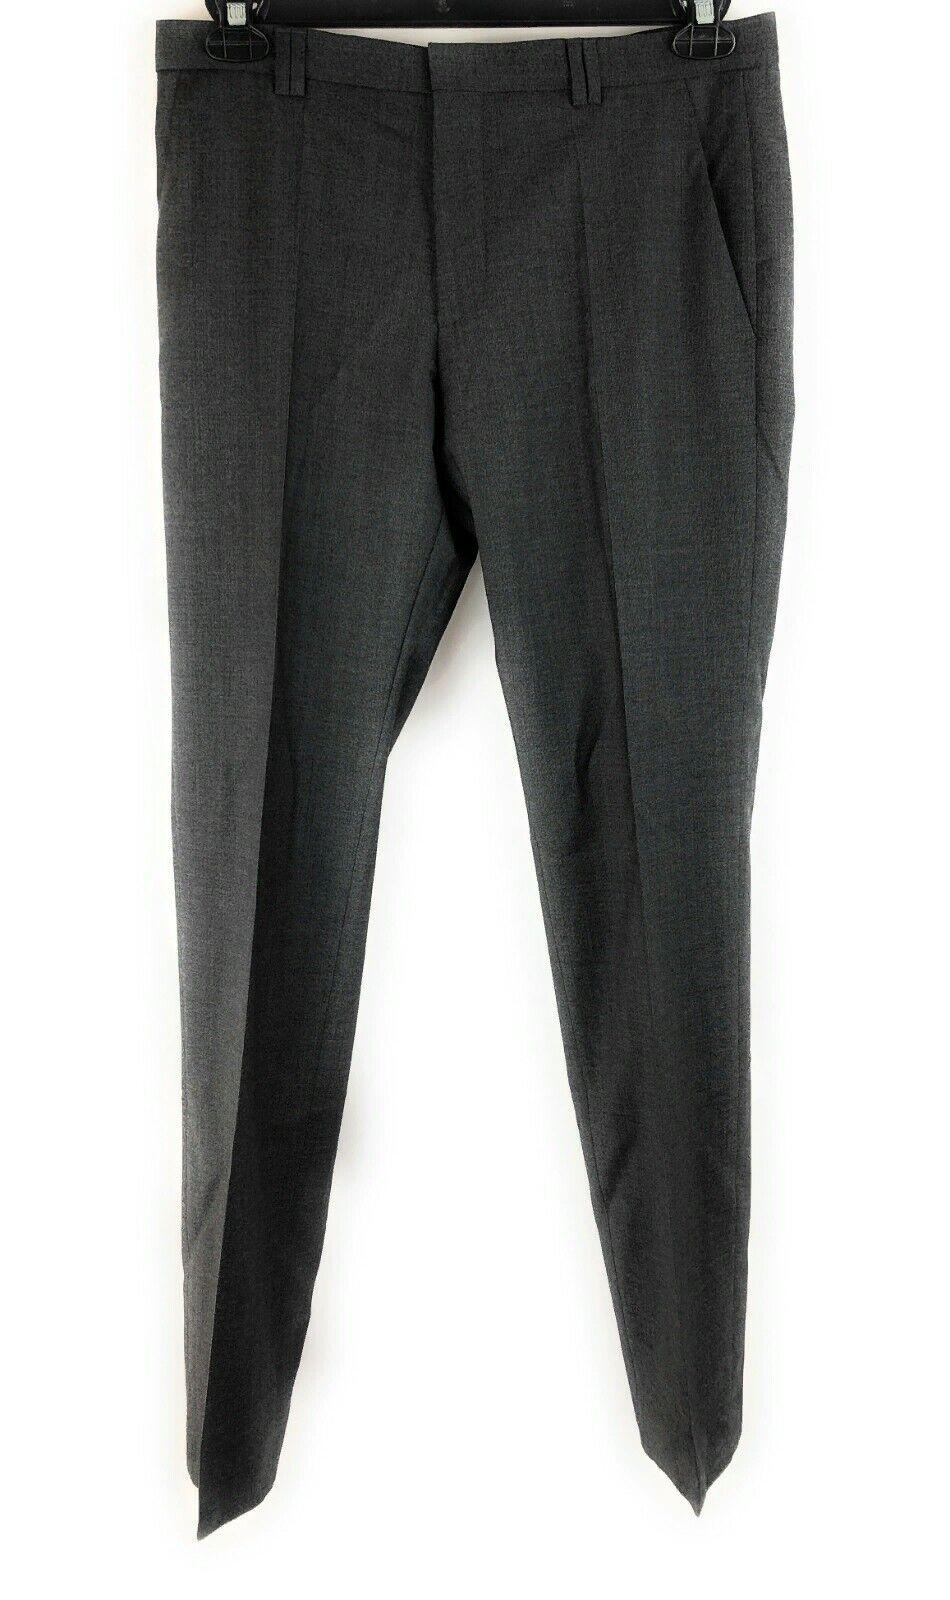 Hugo Boss HImmer1-50306850 Men Dress Pants Dark Grey NWT Auhentic Retail 175 USD